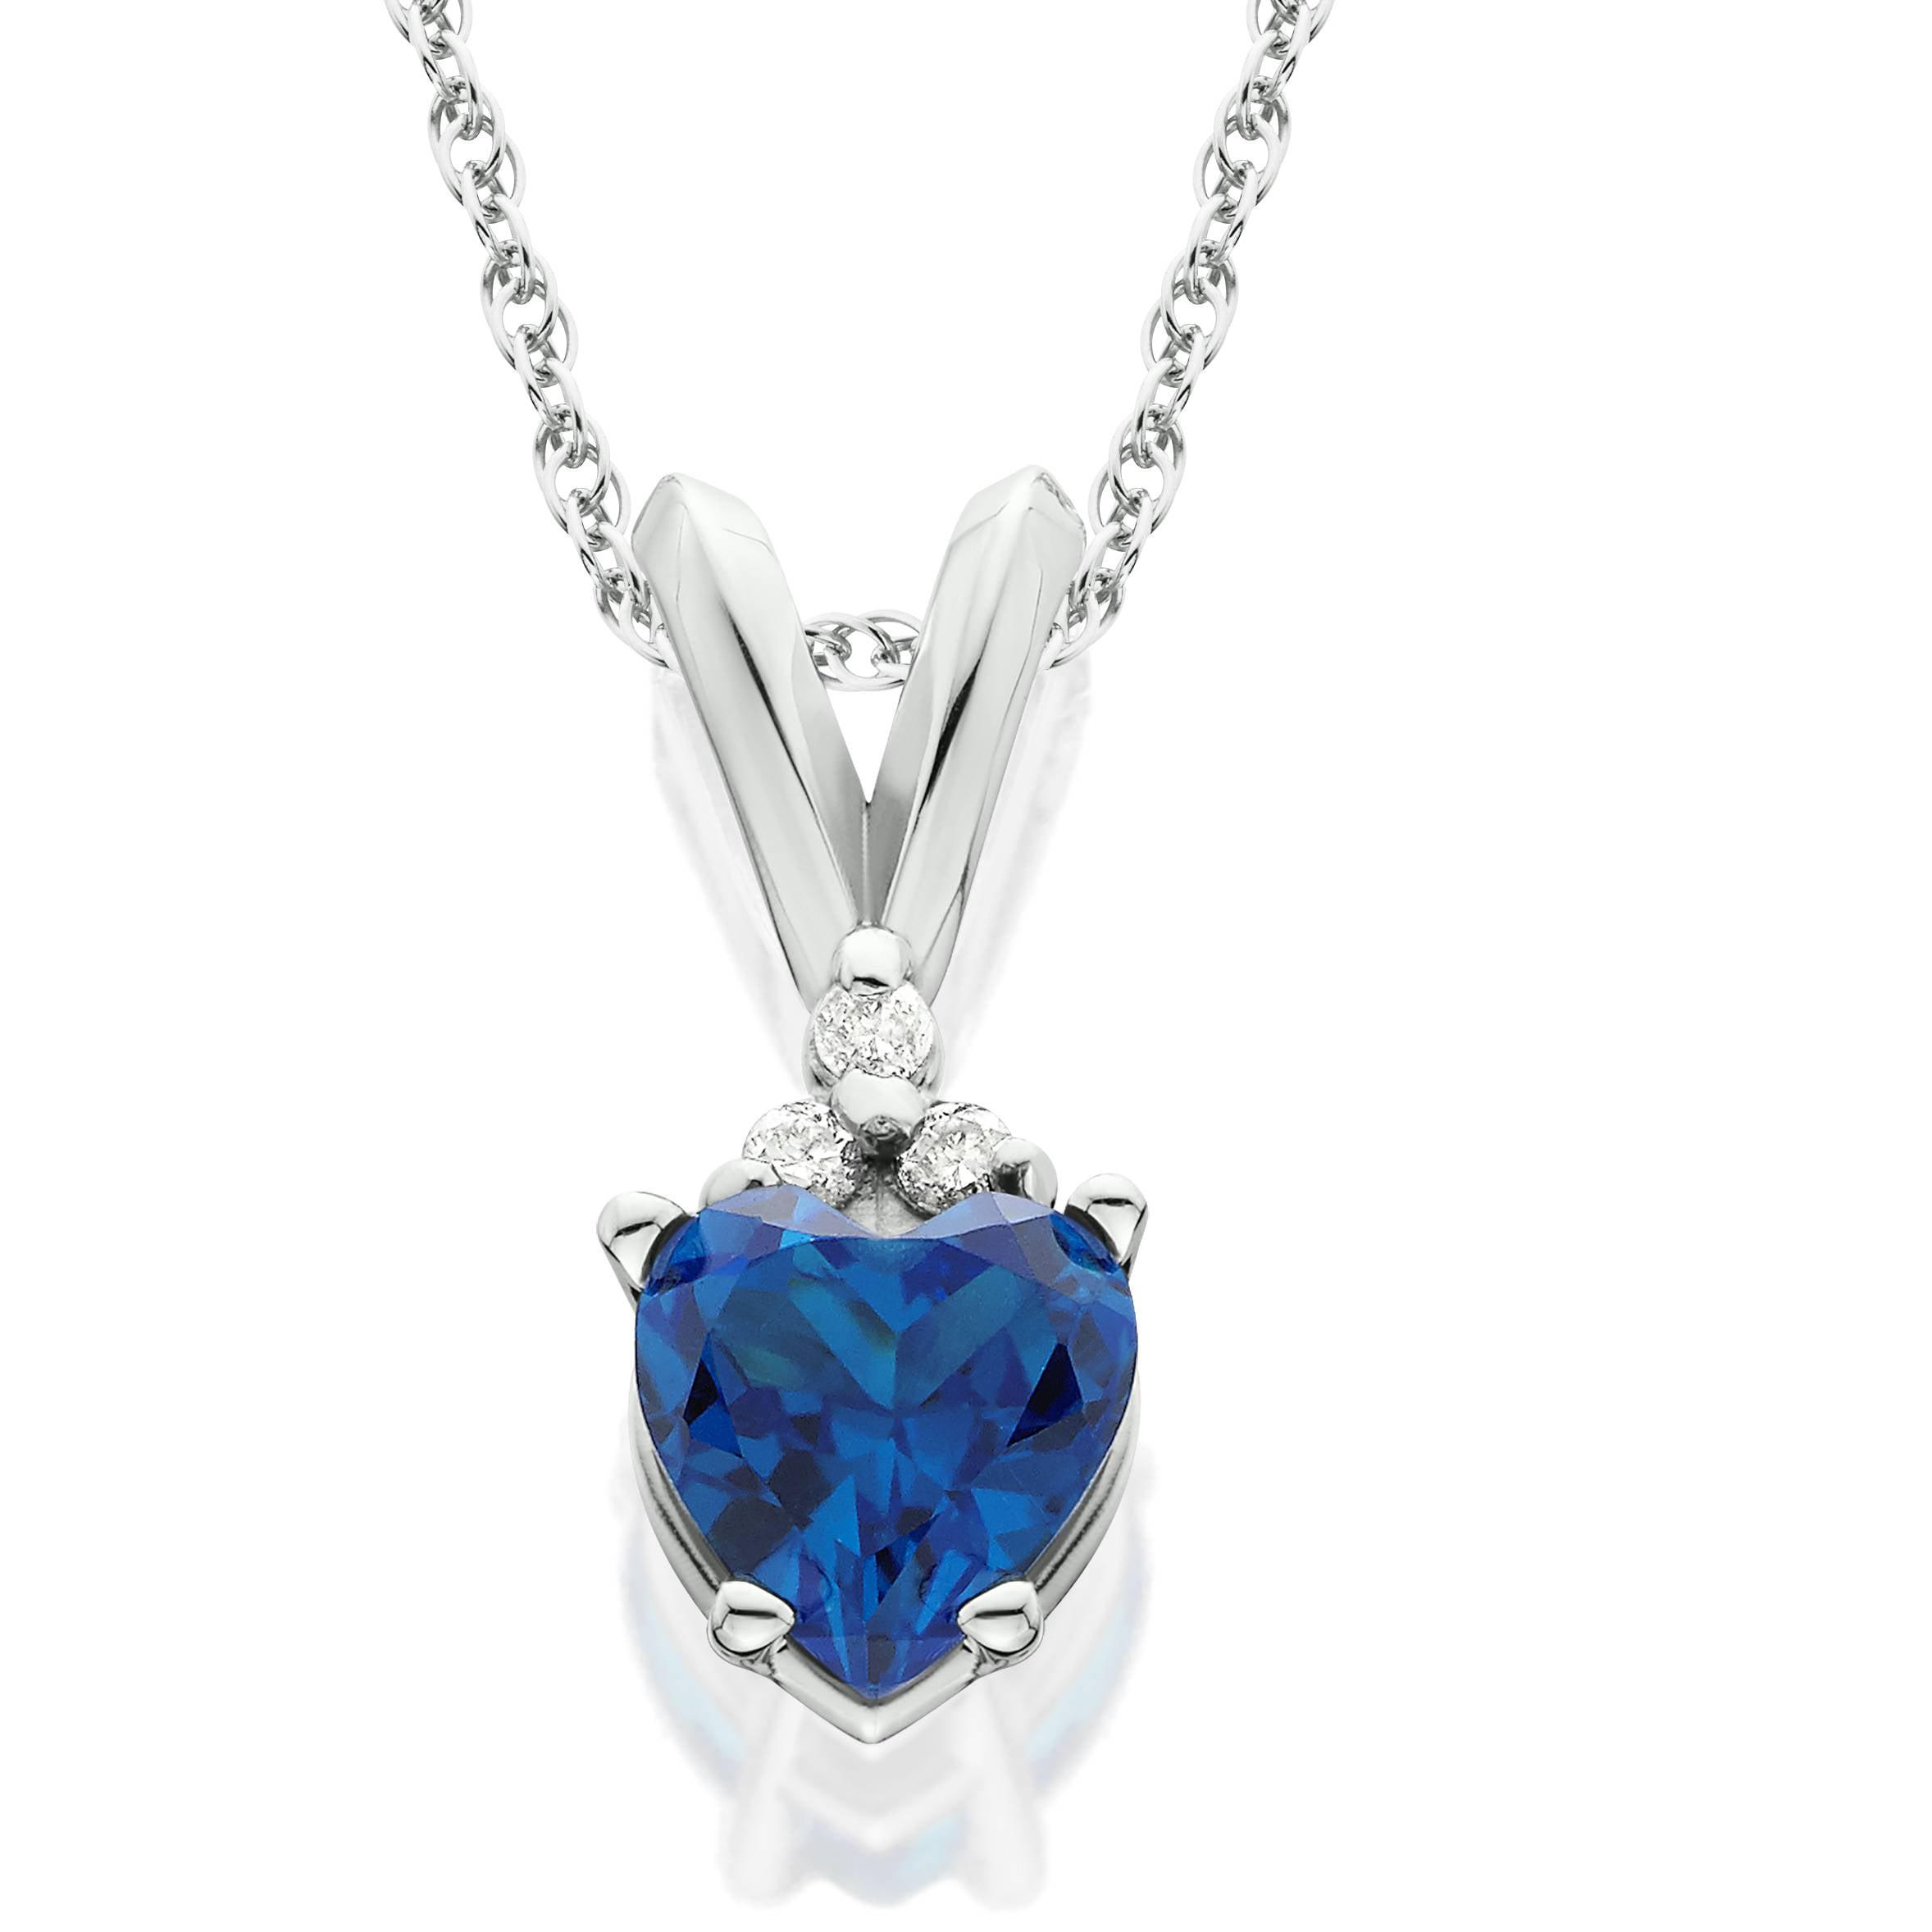 3mm Blue Sapphire Solitaire Round Sapphire Open Heart Pendant